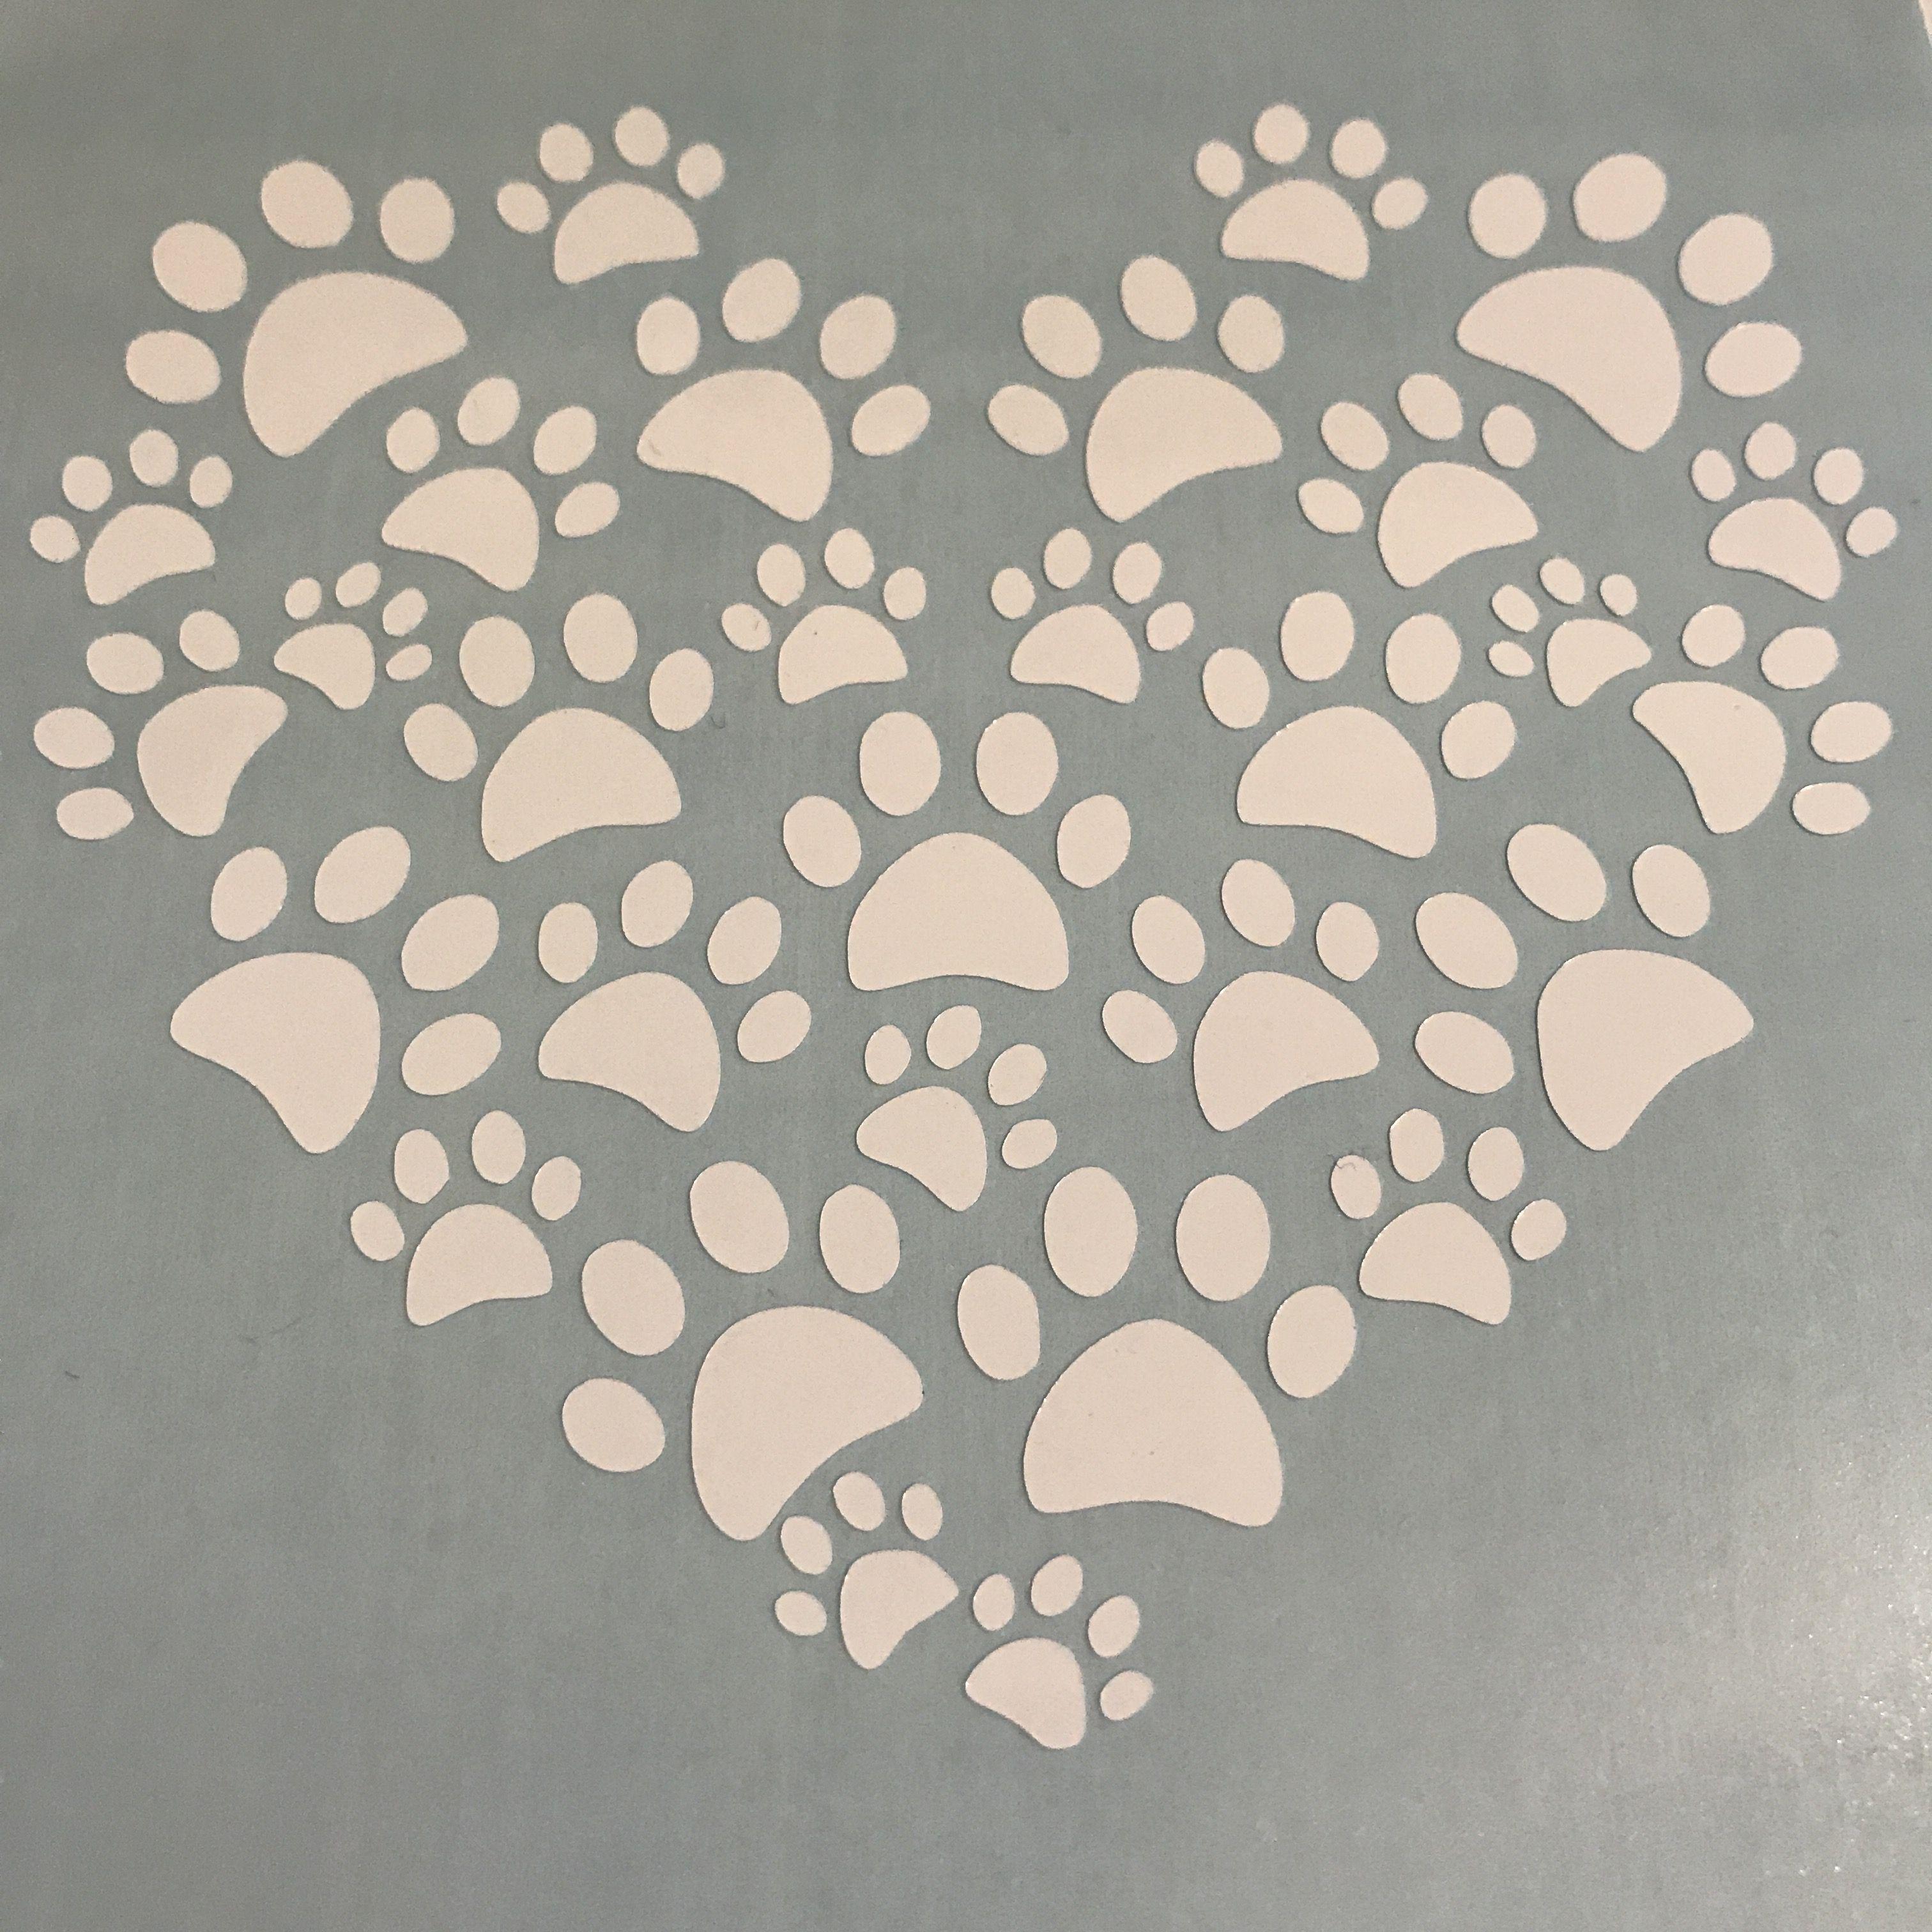 Paw Print Heart Vinyl Decal Custom Vinyl Decals Handmade - Custom vinyl decals printing